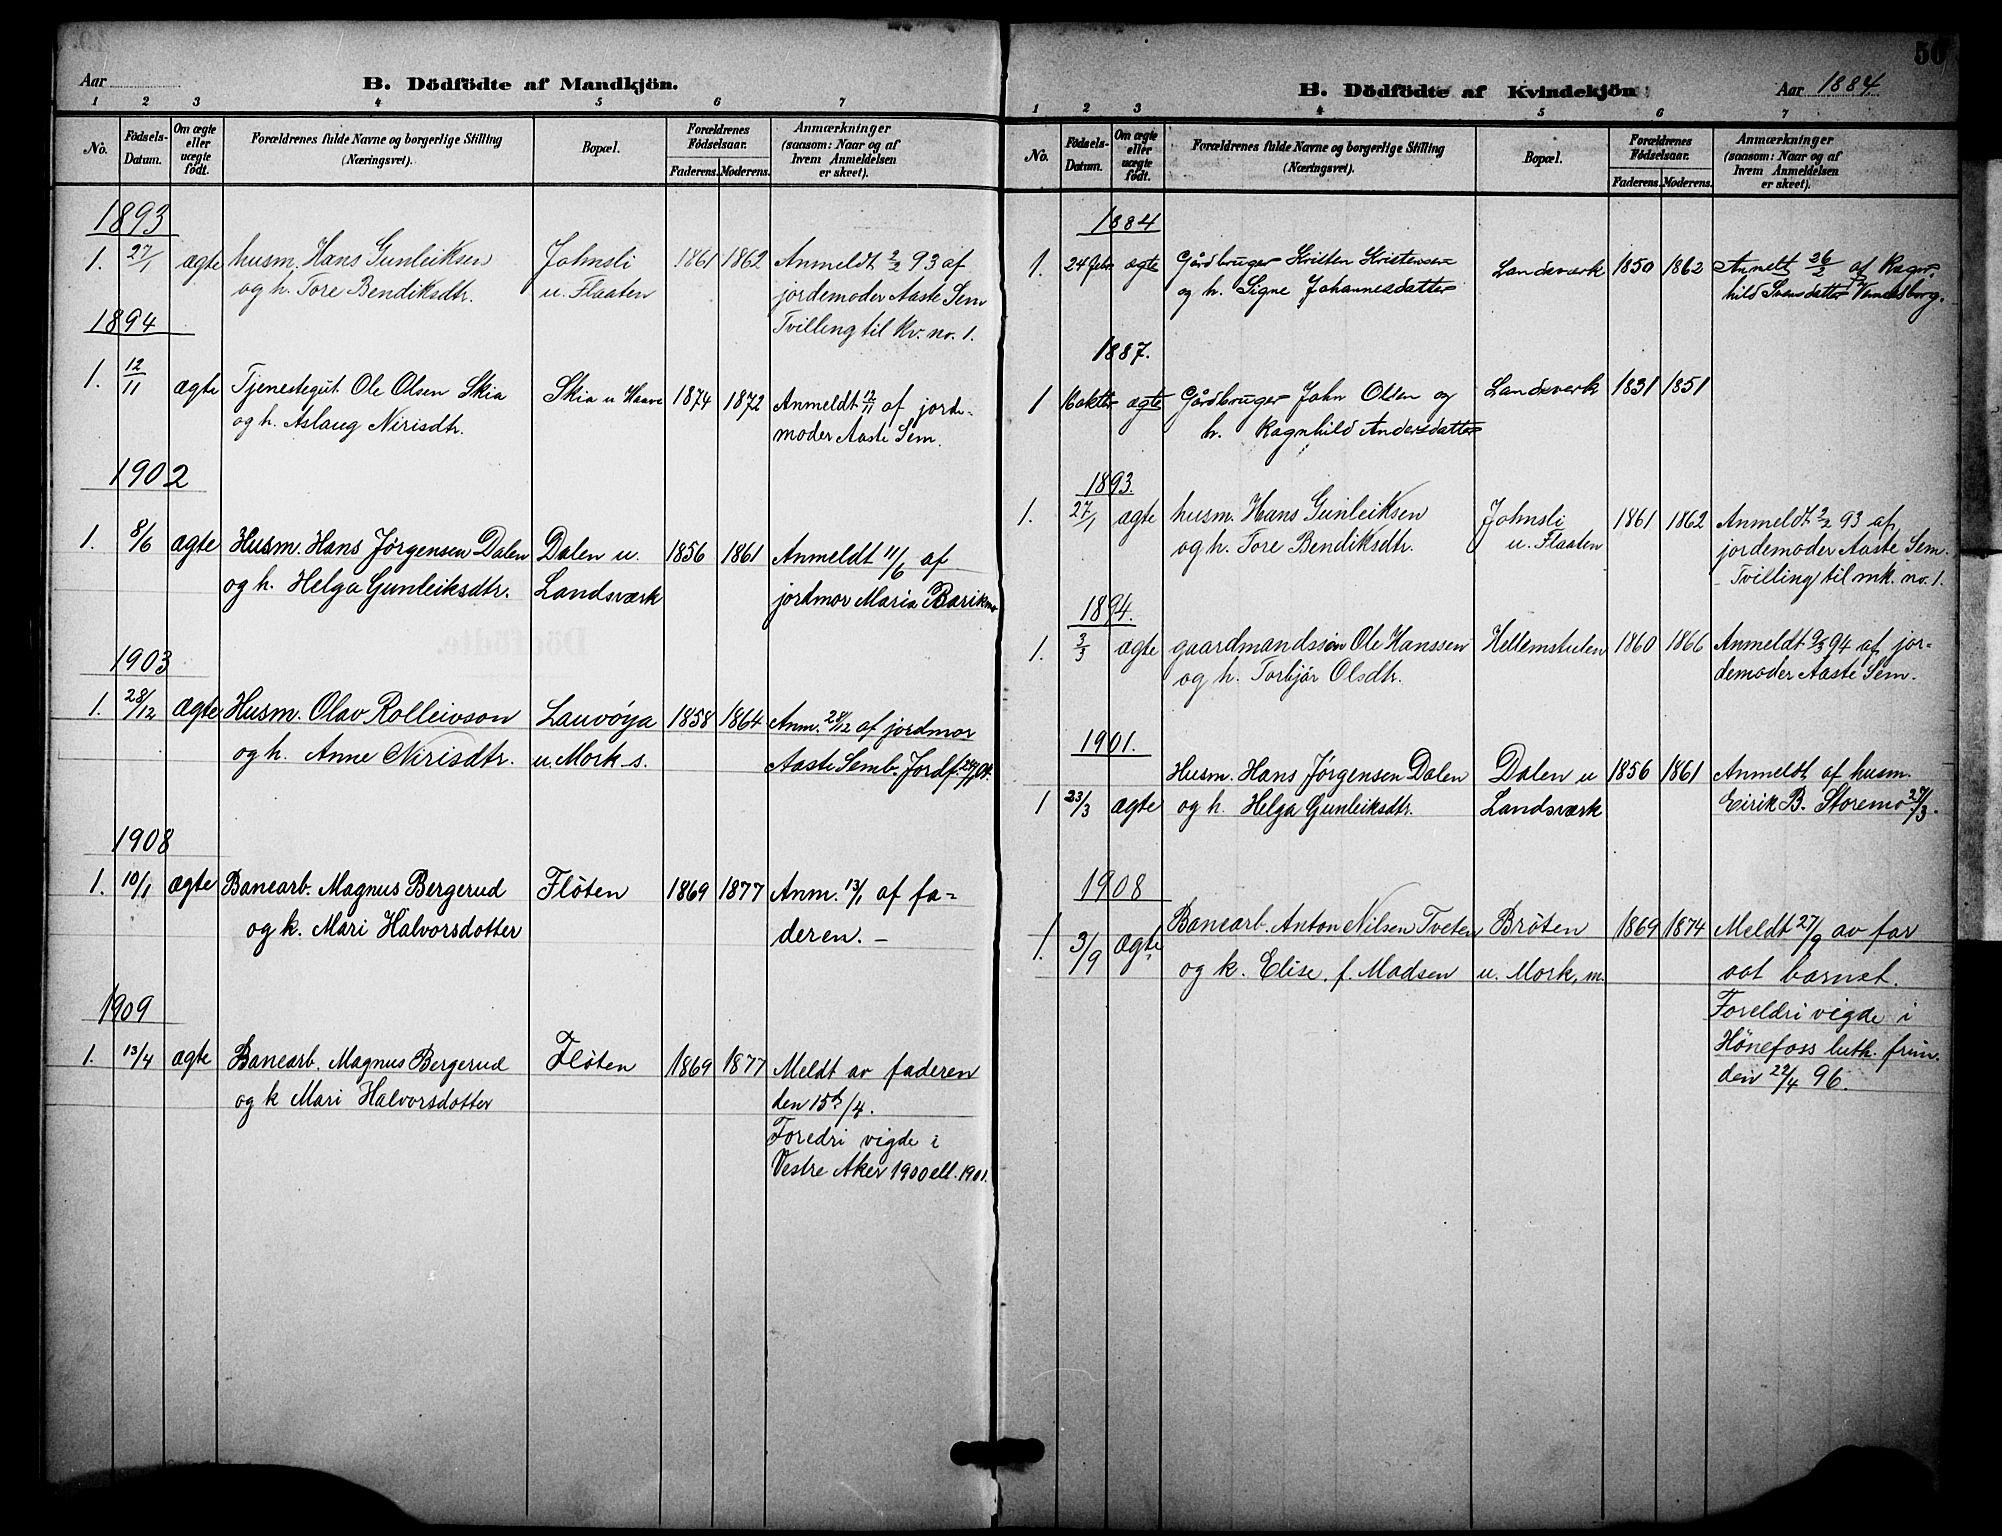 SAKO, Heddal kirkebøker, F/Fb/L0001: Ministerialbok nr. II 1, 1884-1910, s. 50